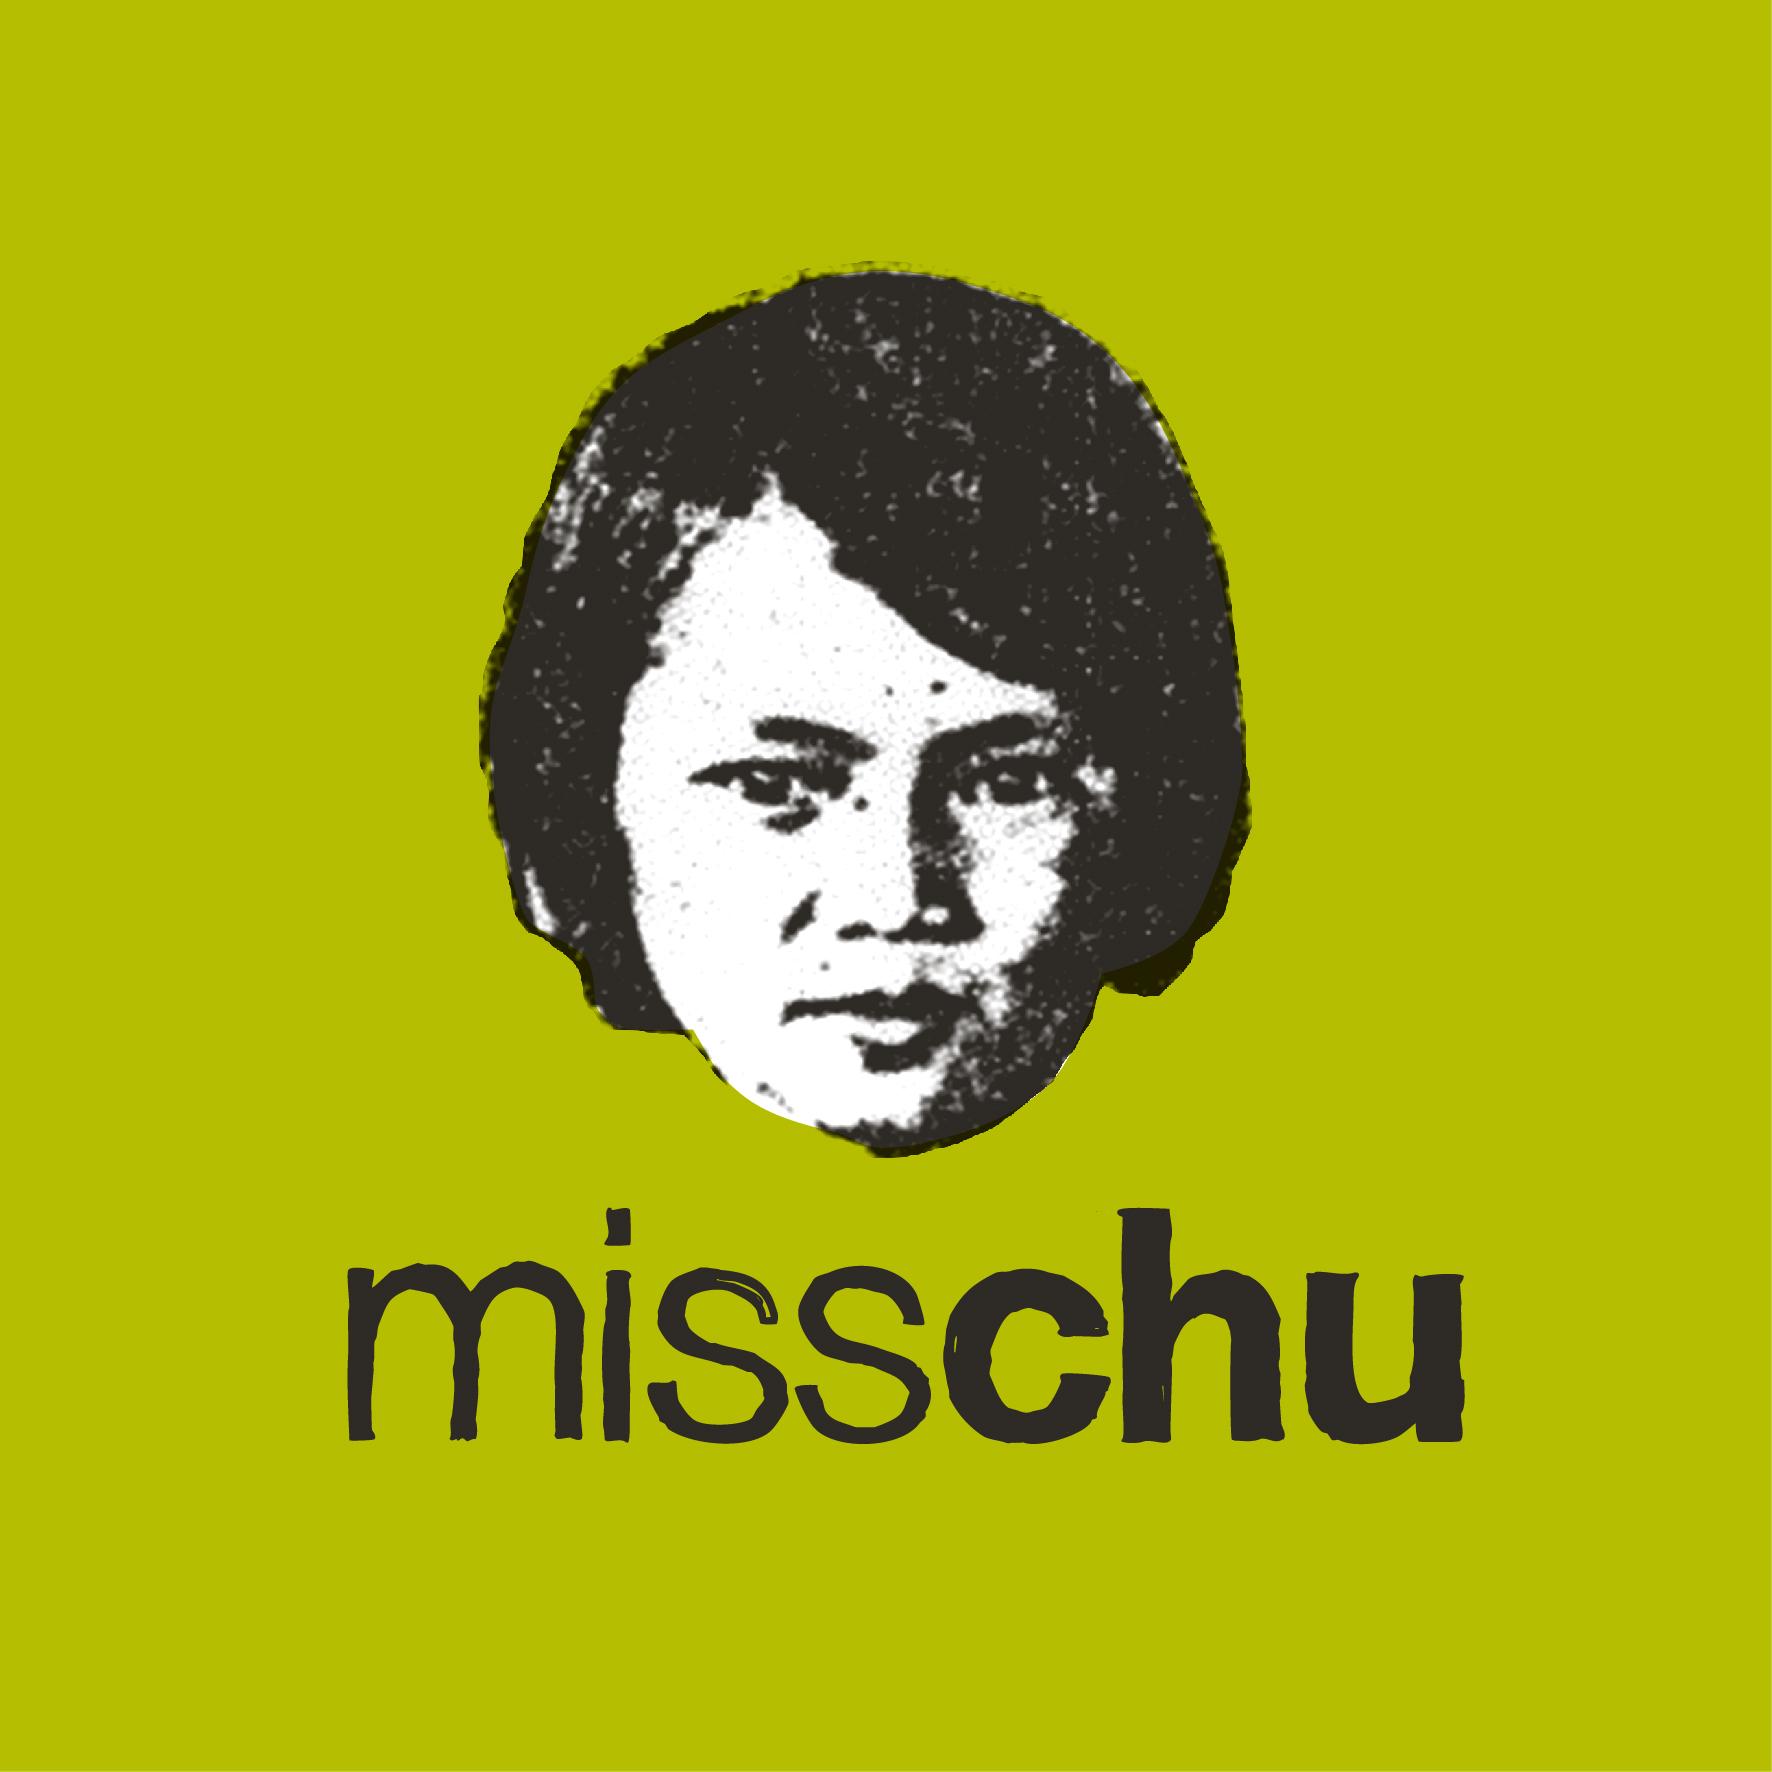 misschu the original Asian street-food 'tuckshop' - New franchise Mornington